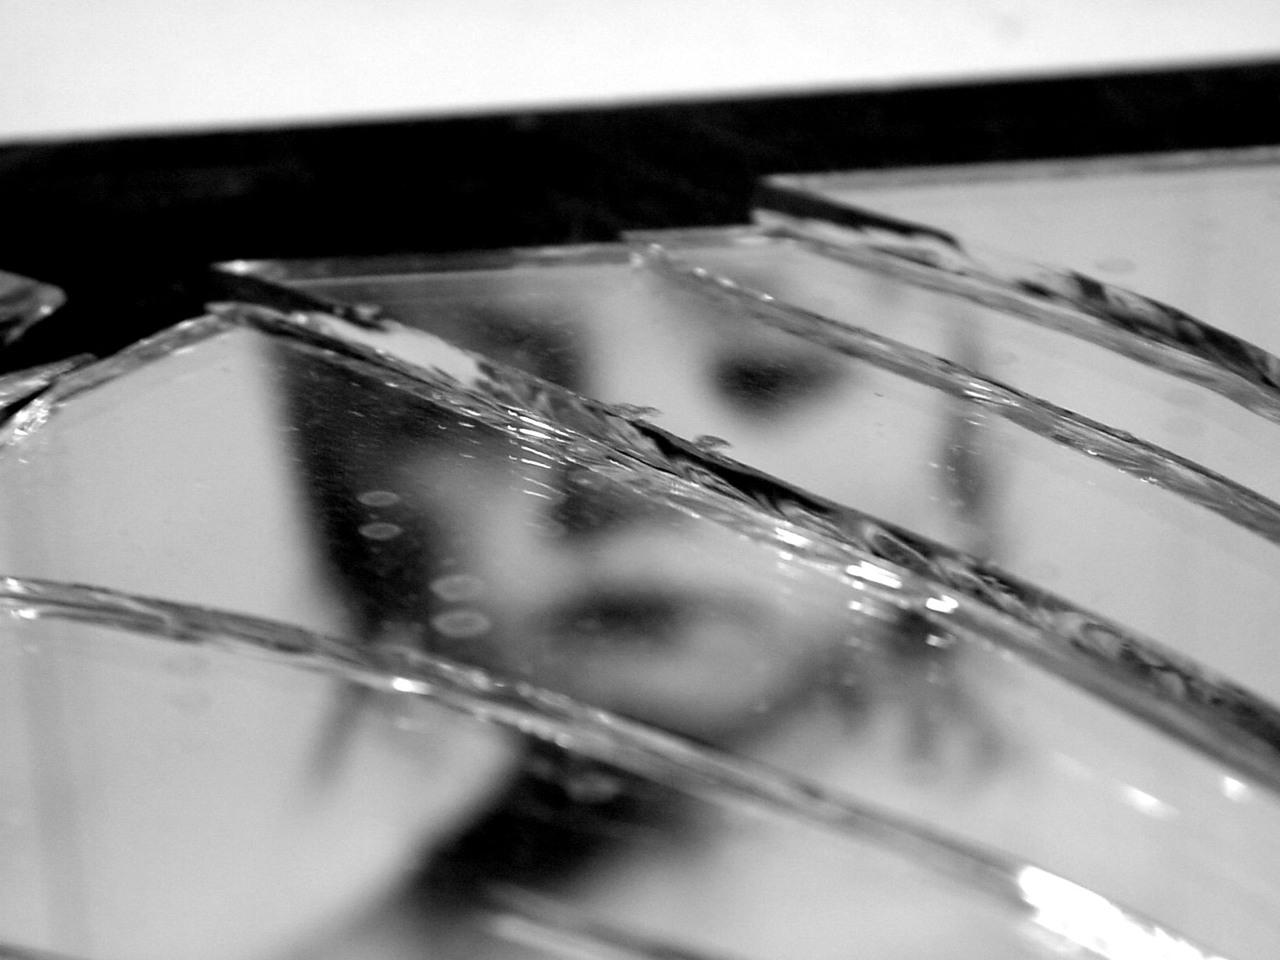 broken-mirror-3-1317214-1280x960